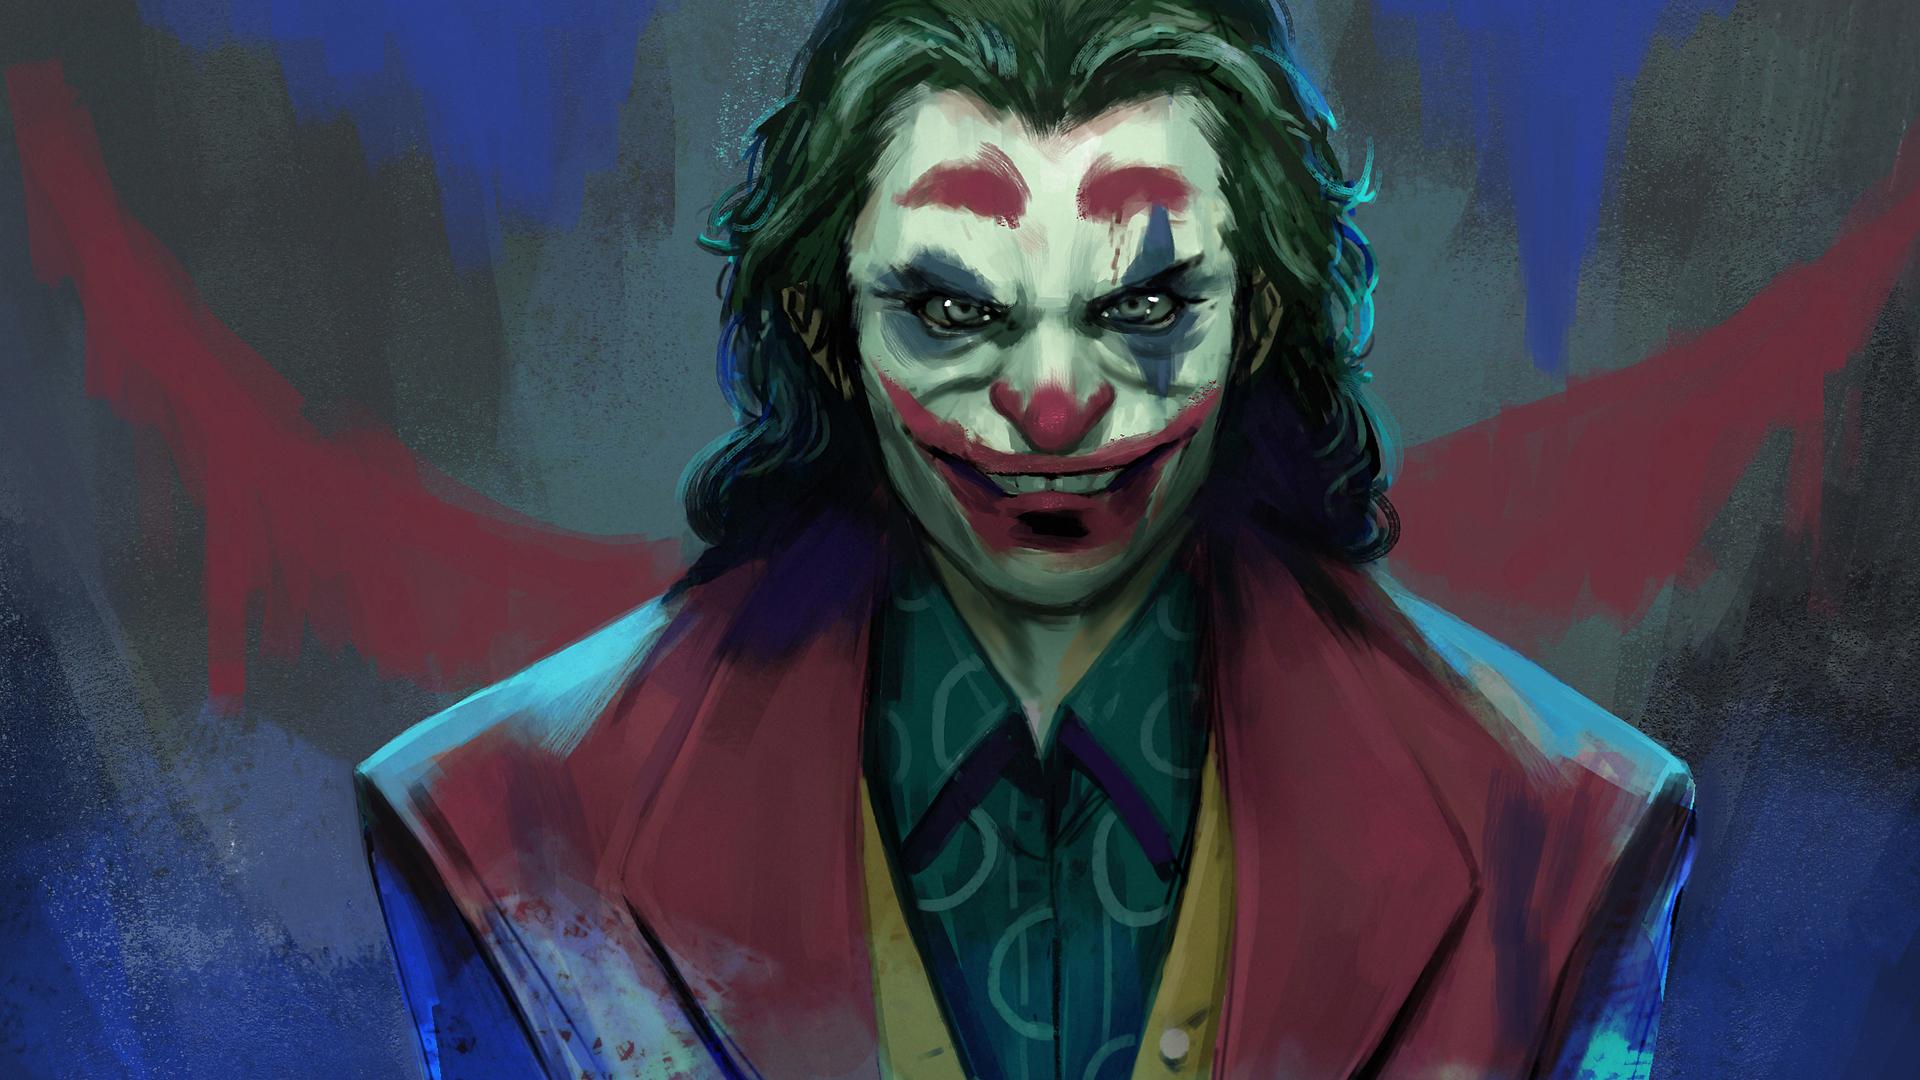 Joaquin Phoenix Joker Wallpaper Hd 1080p